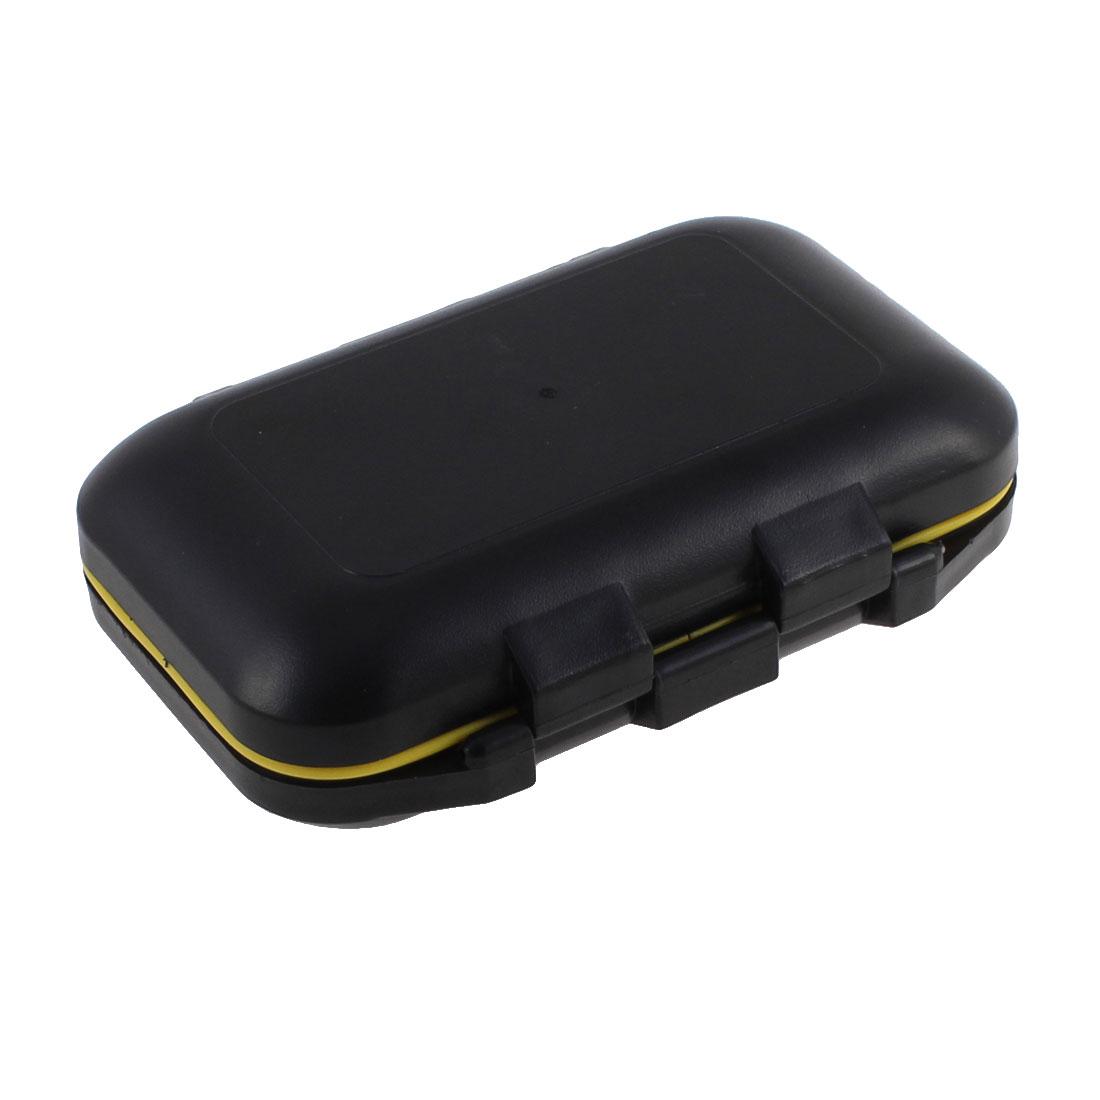 Plastic 12 Compartments Fishing Hooks Holder Case Box Organizer Black